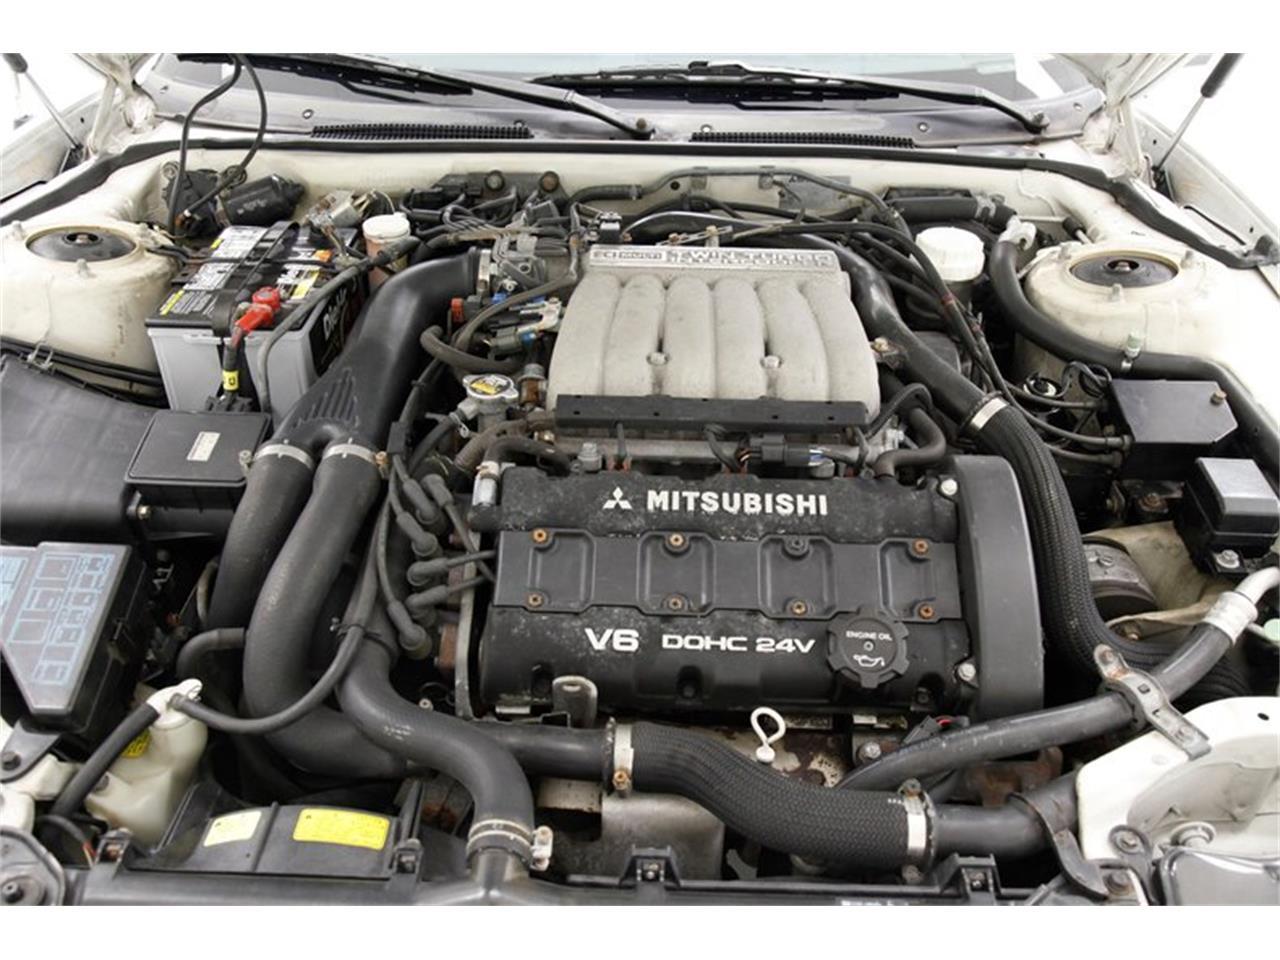 1996 Mitsubishi 3000 (CC-1356356) for sale in Morgantown, Pennsylvania